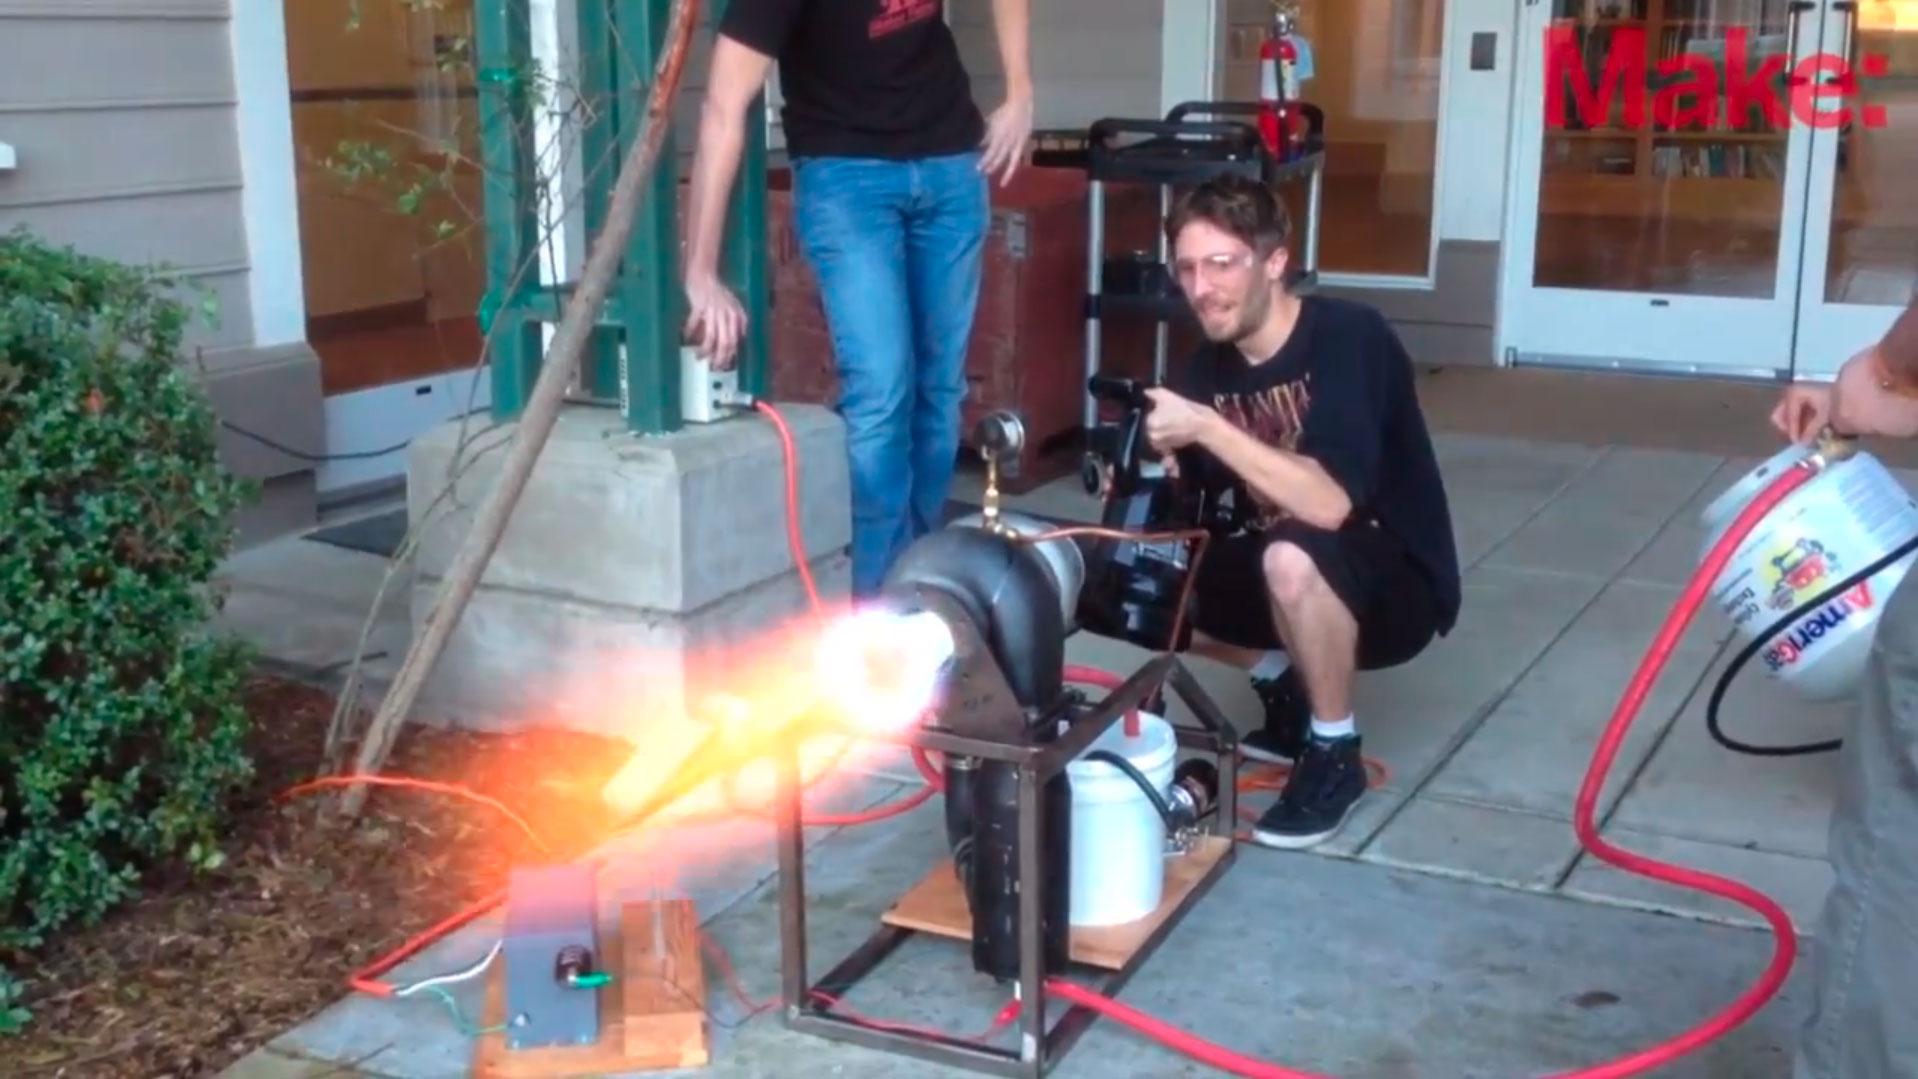 Sneak Peek at the Make: Labs DIY Turbojet Engine Project